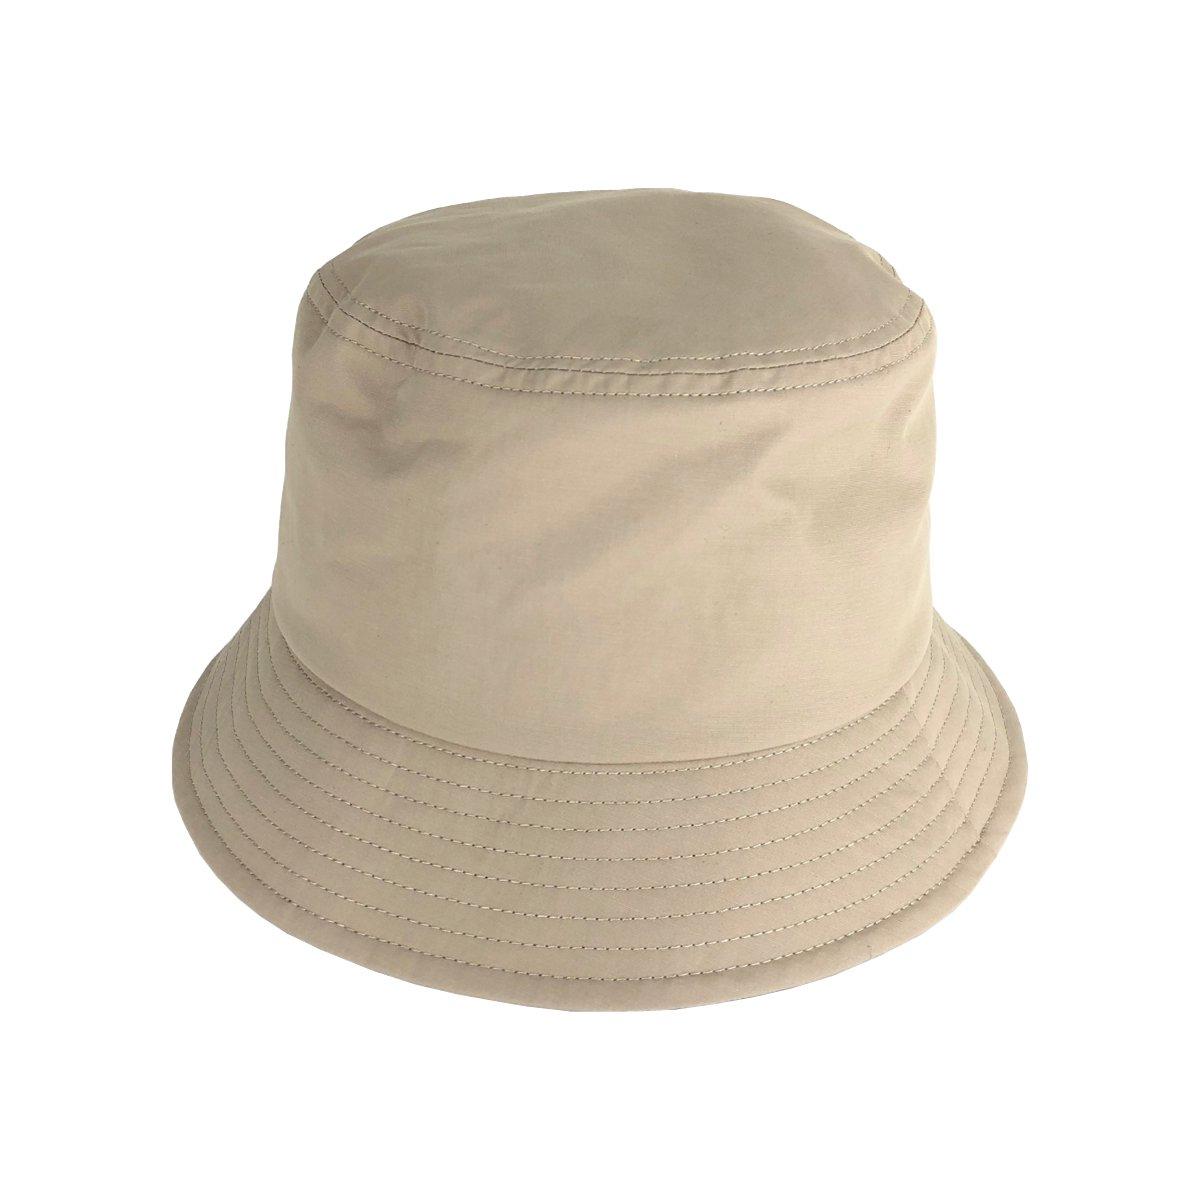 Genius BK Hat 詳細画像1